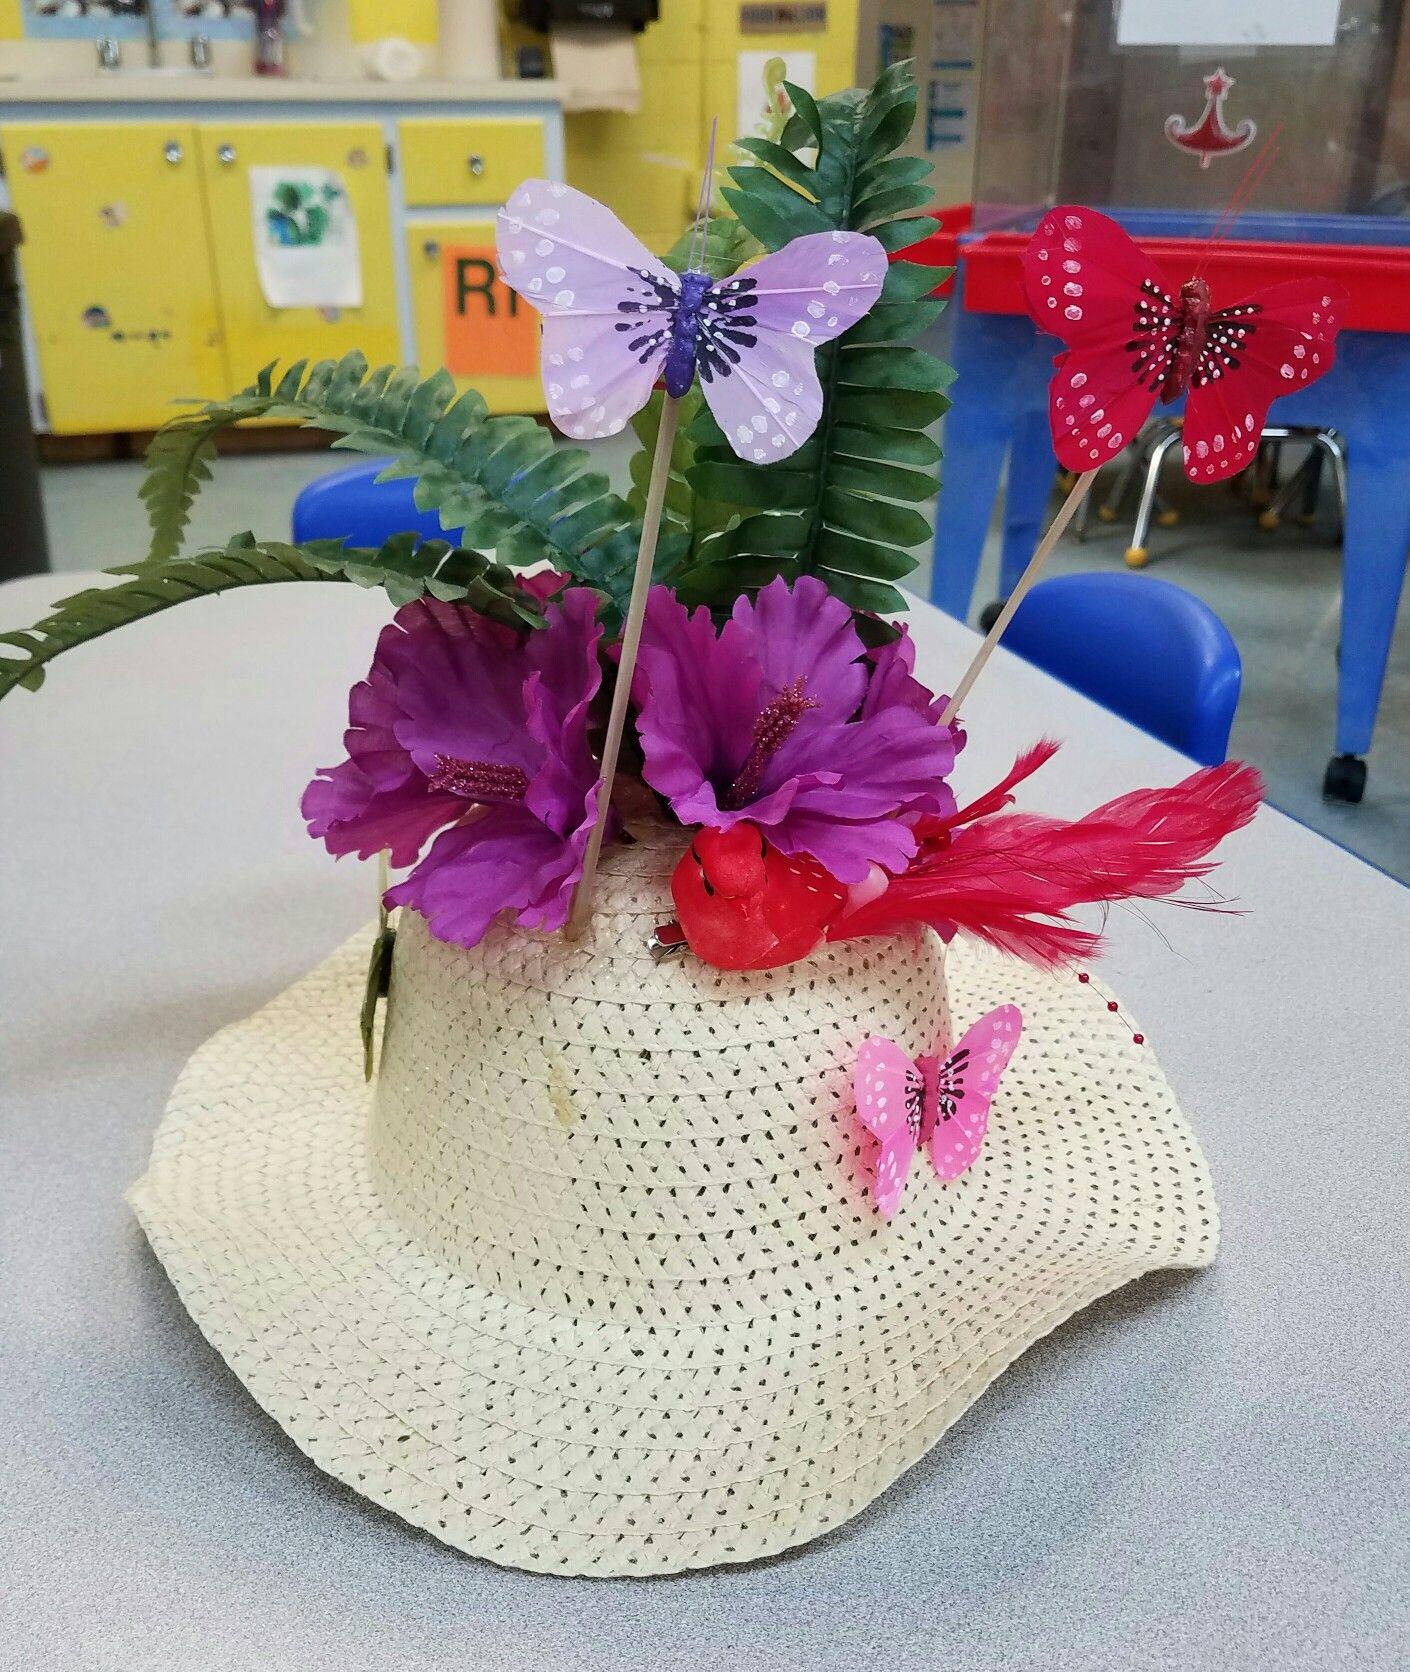 Crazy Hat Decoration Ideas: Crazy Hat Day! Spring Fever!